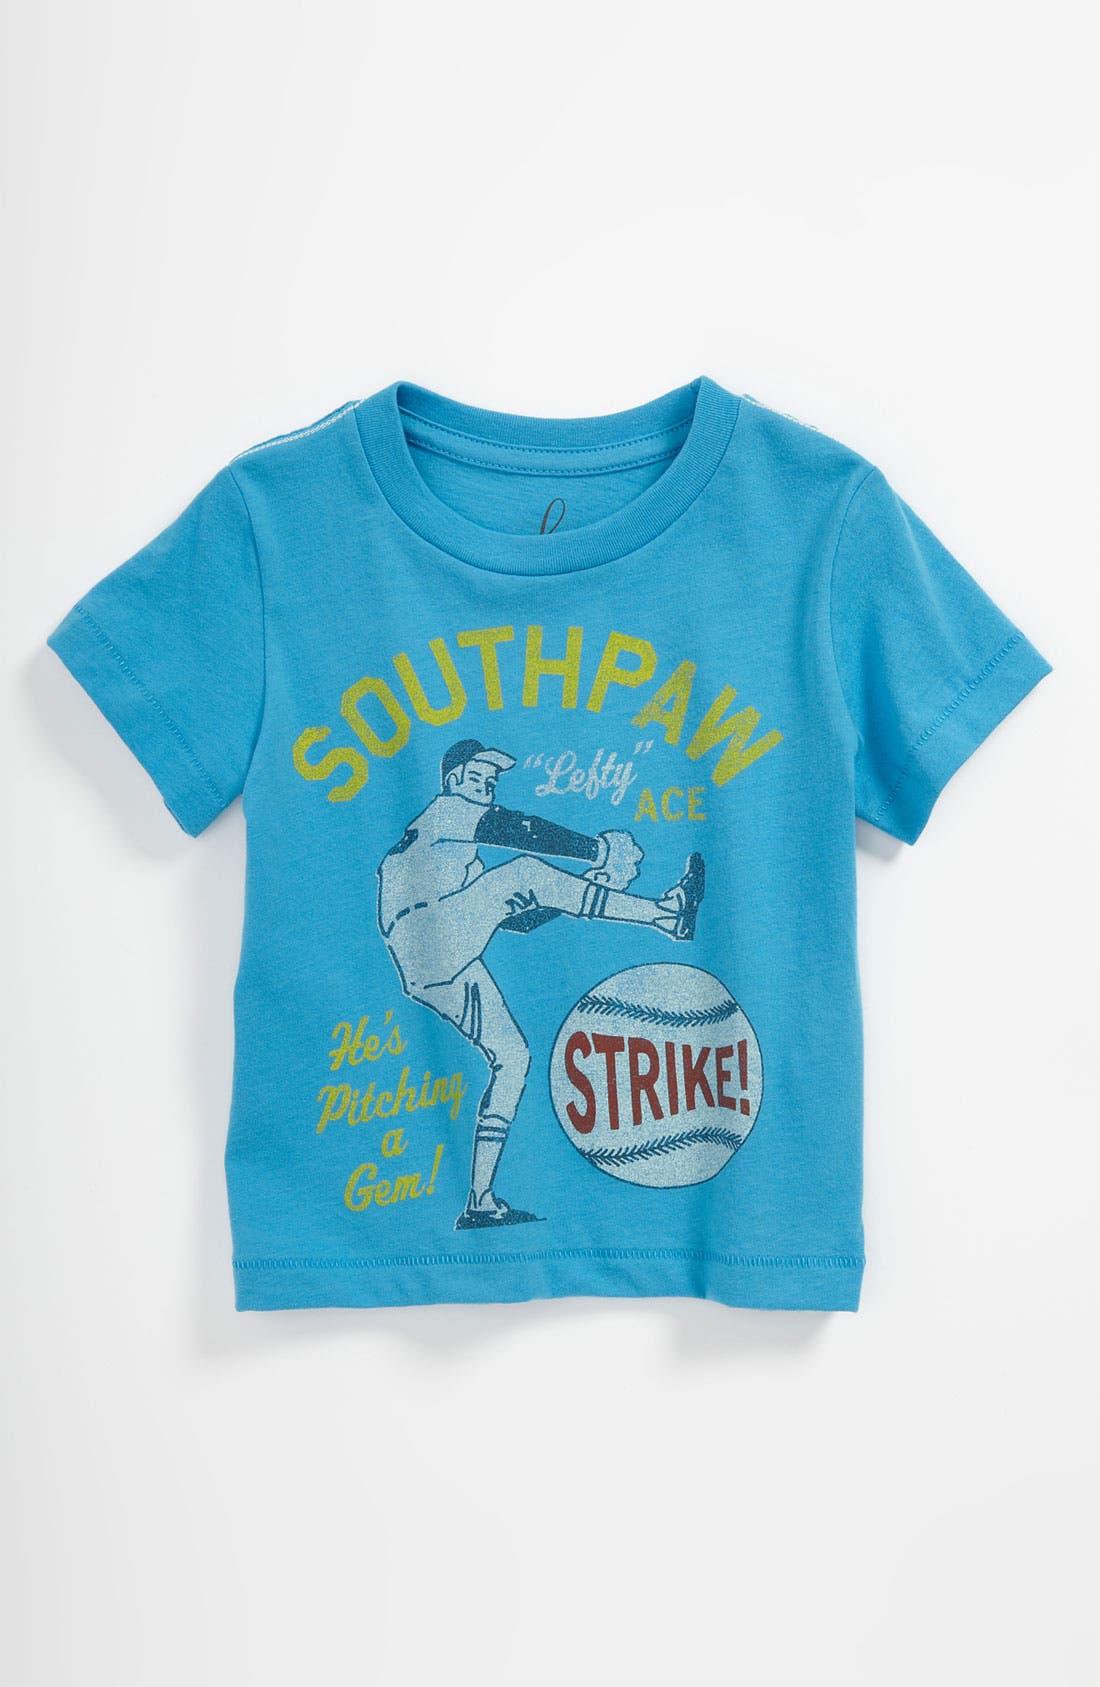 Main Image - Peek 'Southpaw' T-Shirt (Baby)